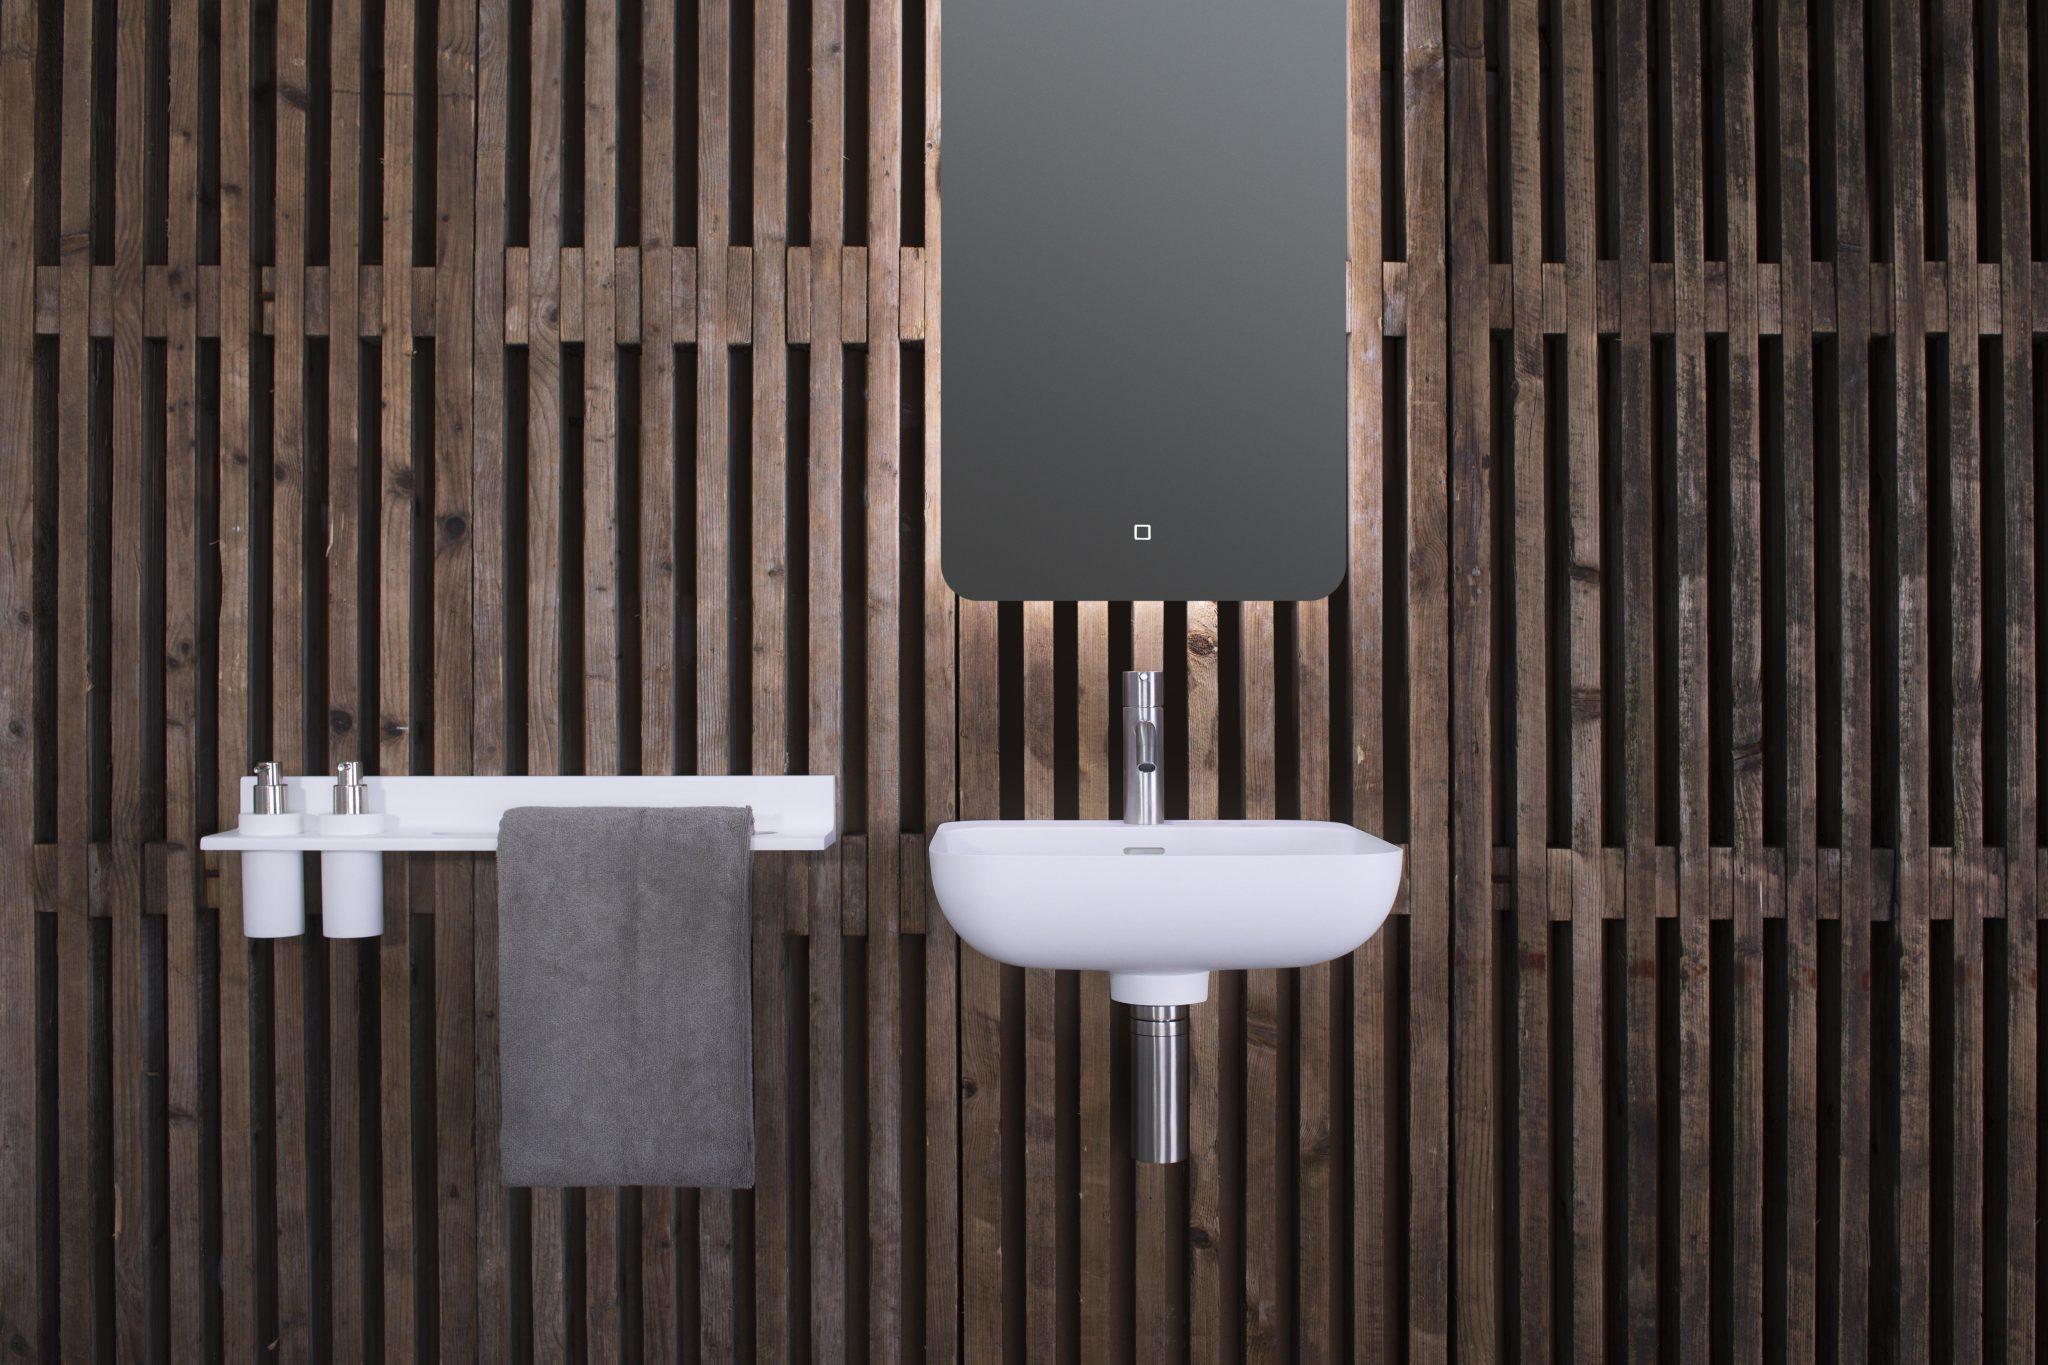 en-40-wash-basin-from-copenhagen-bath_27888658970_o